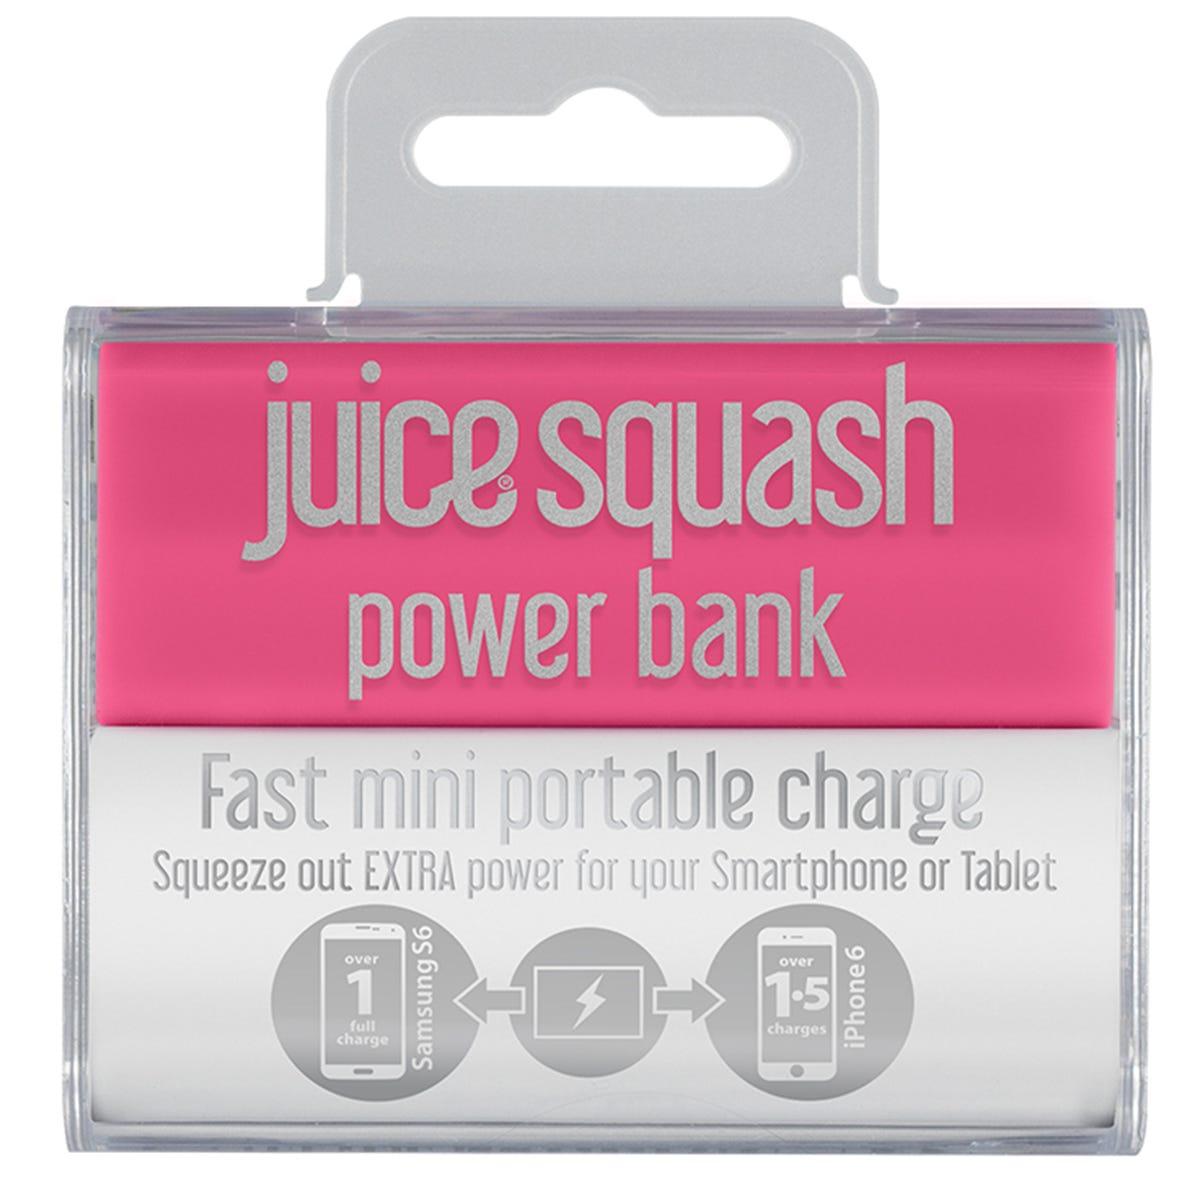 Image of Juice Squash 2,800mAh Power Bank - Pink